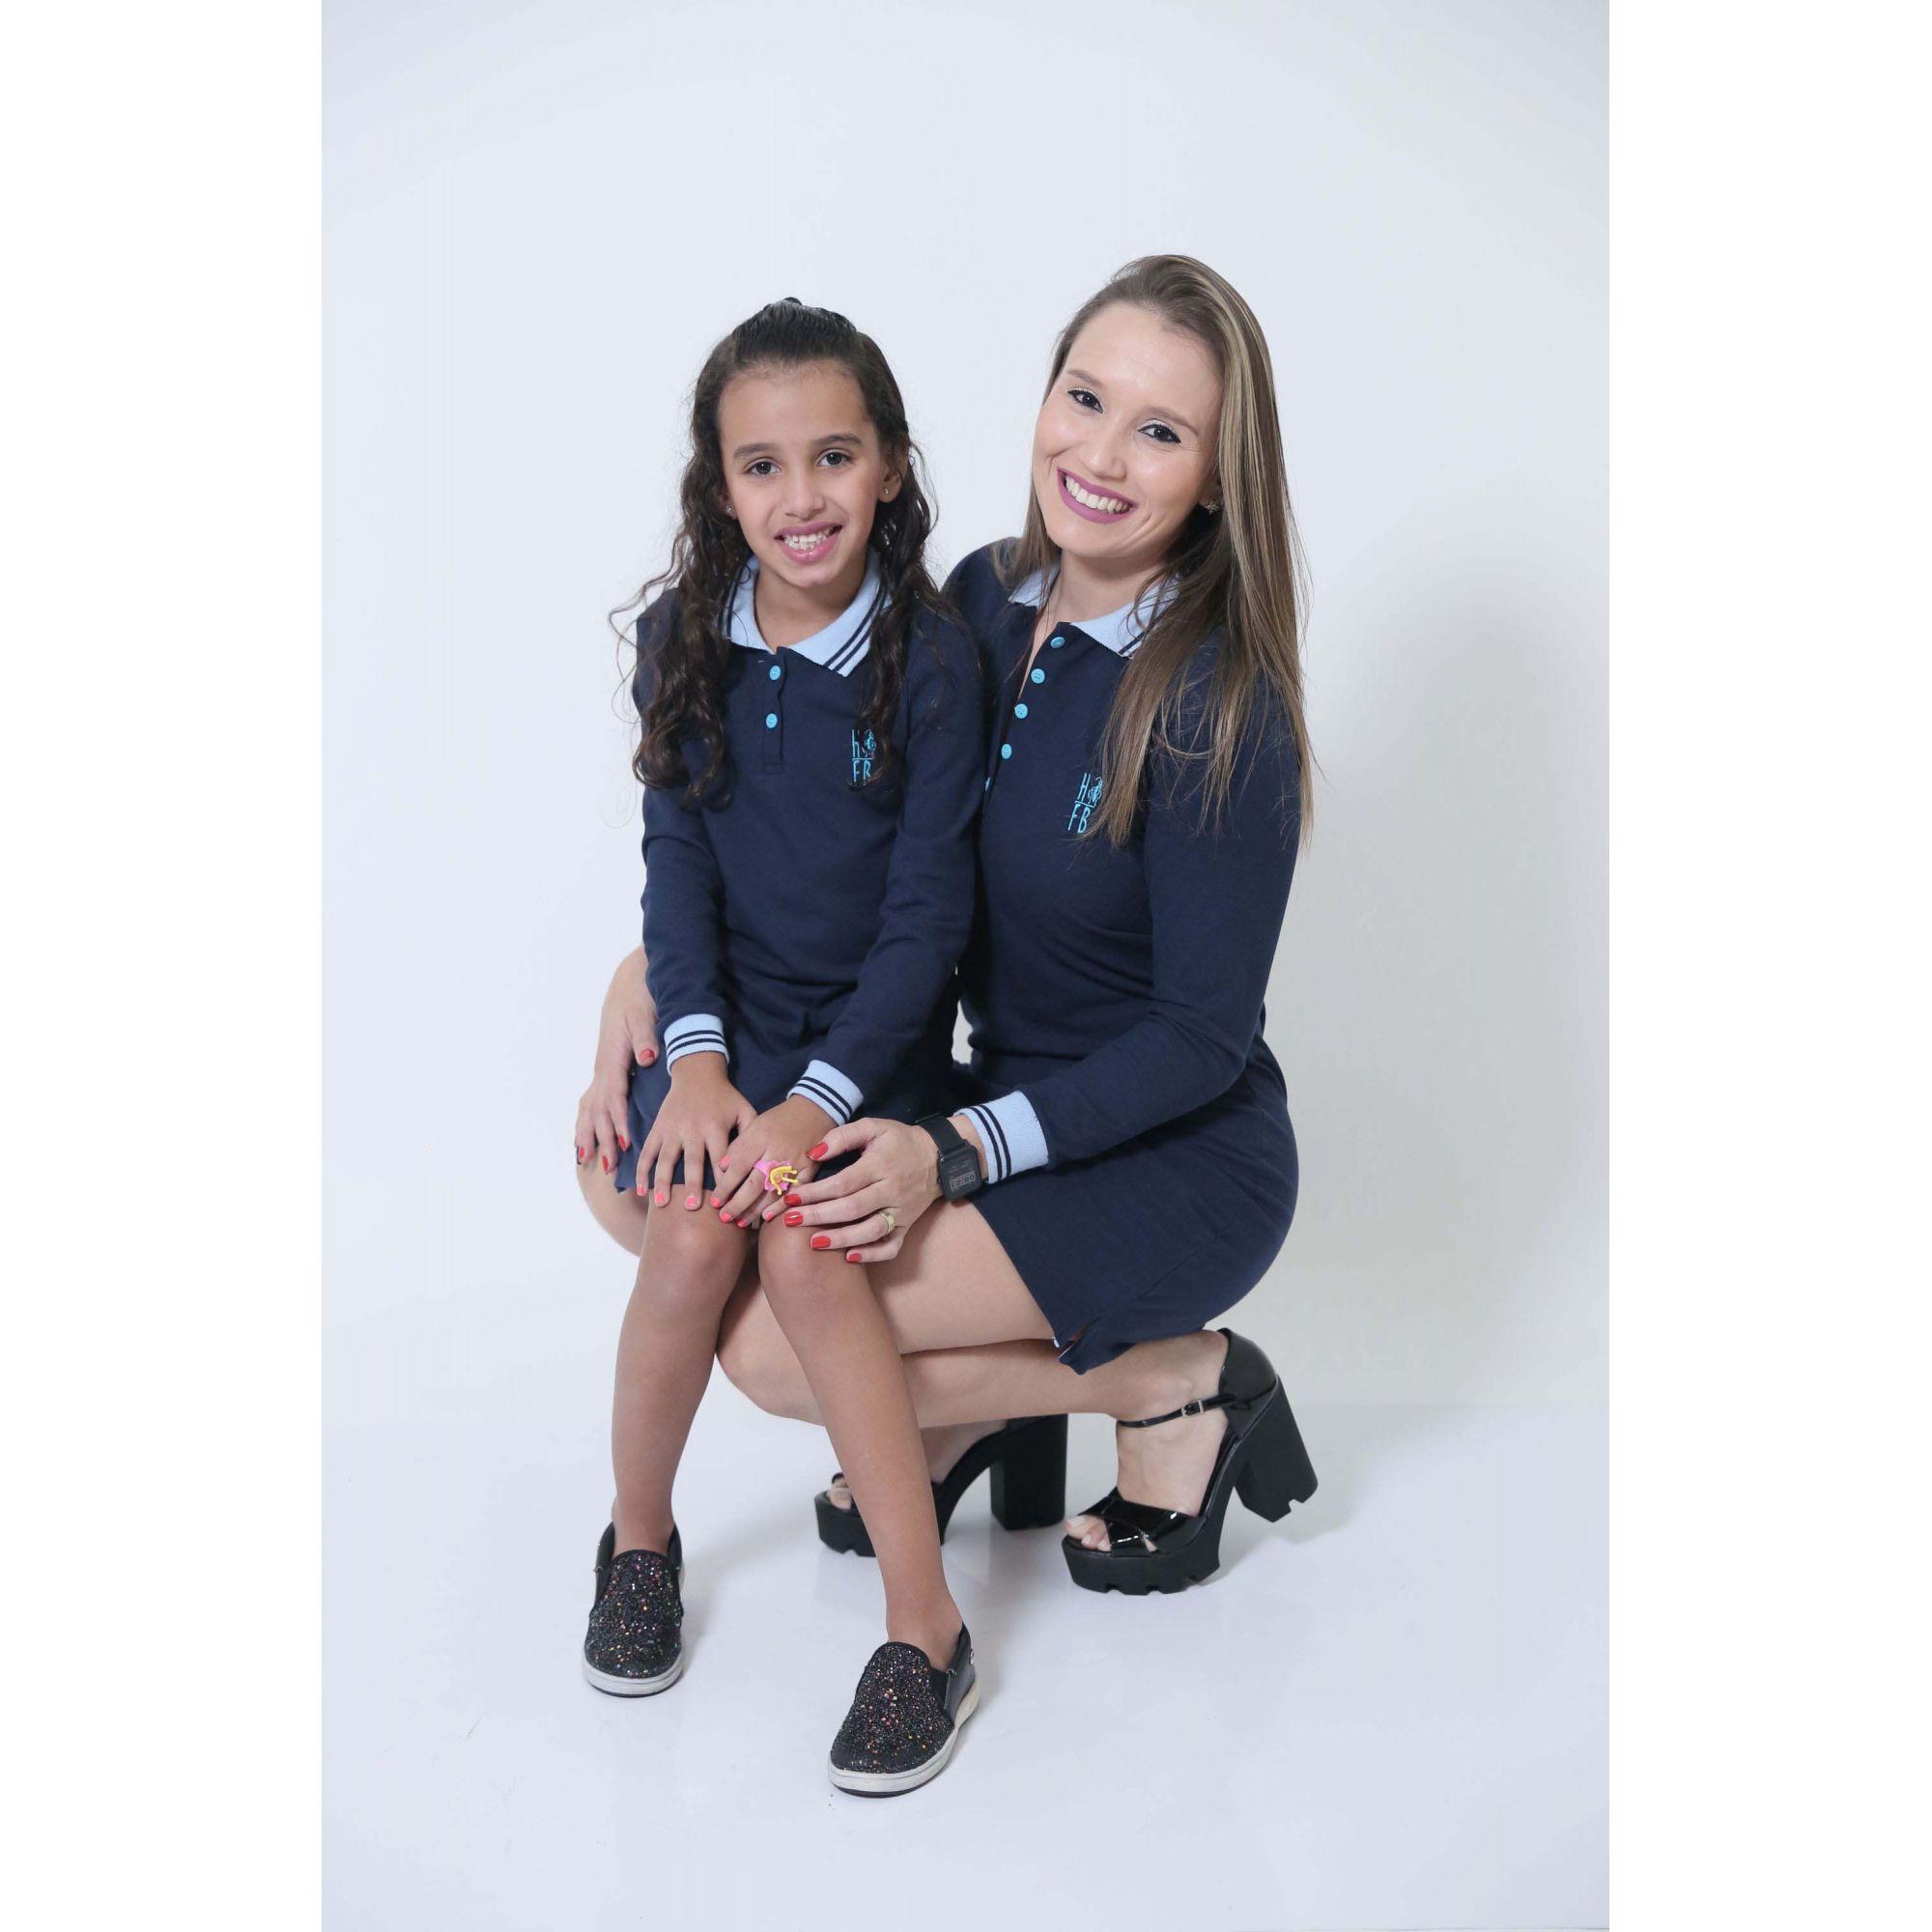 MÃE E FILHA > Kit 02 Vestidos Azul Manga Longa [Coleção Tal Mãe Tal Filha]  - Heitor Fashion Brazil